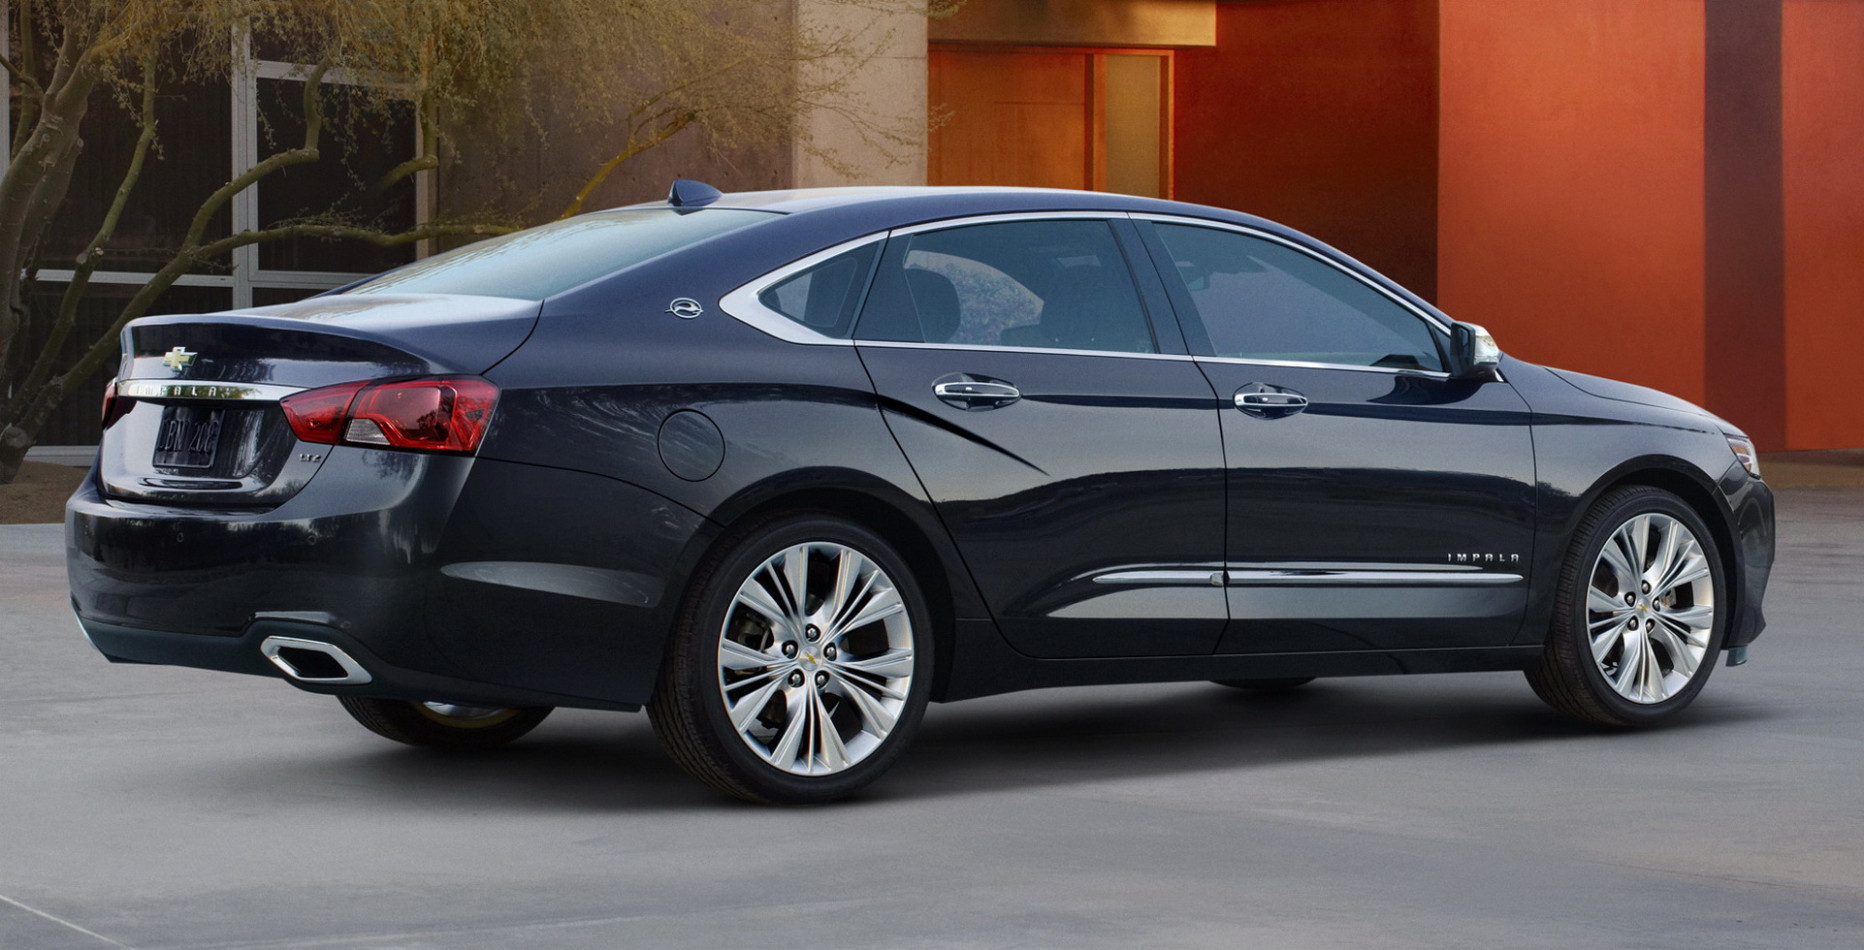 New Concept 2022 Chevy Impala SS